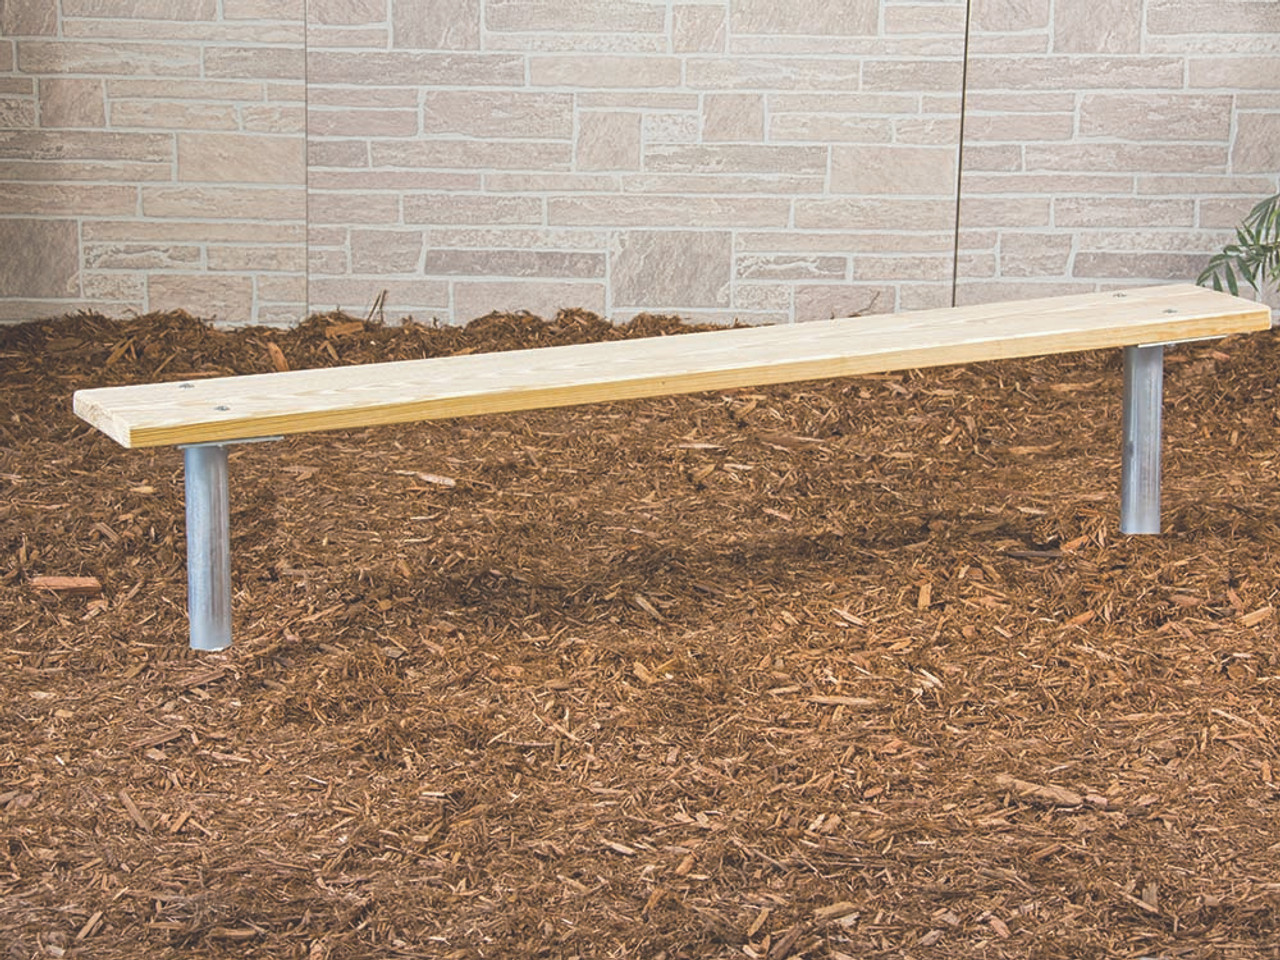 8' Treated Lumber Team Bench